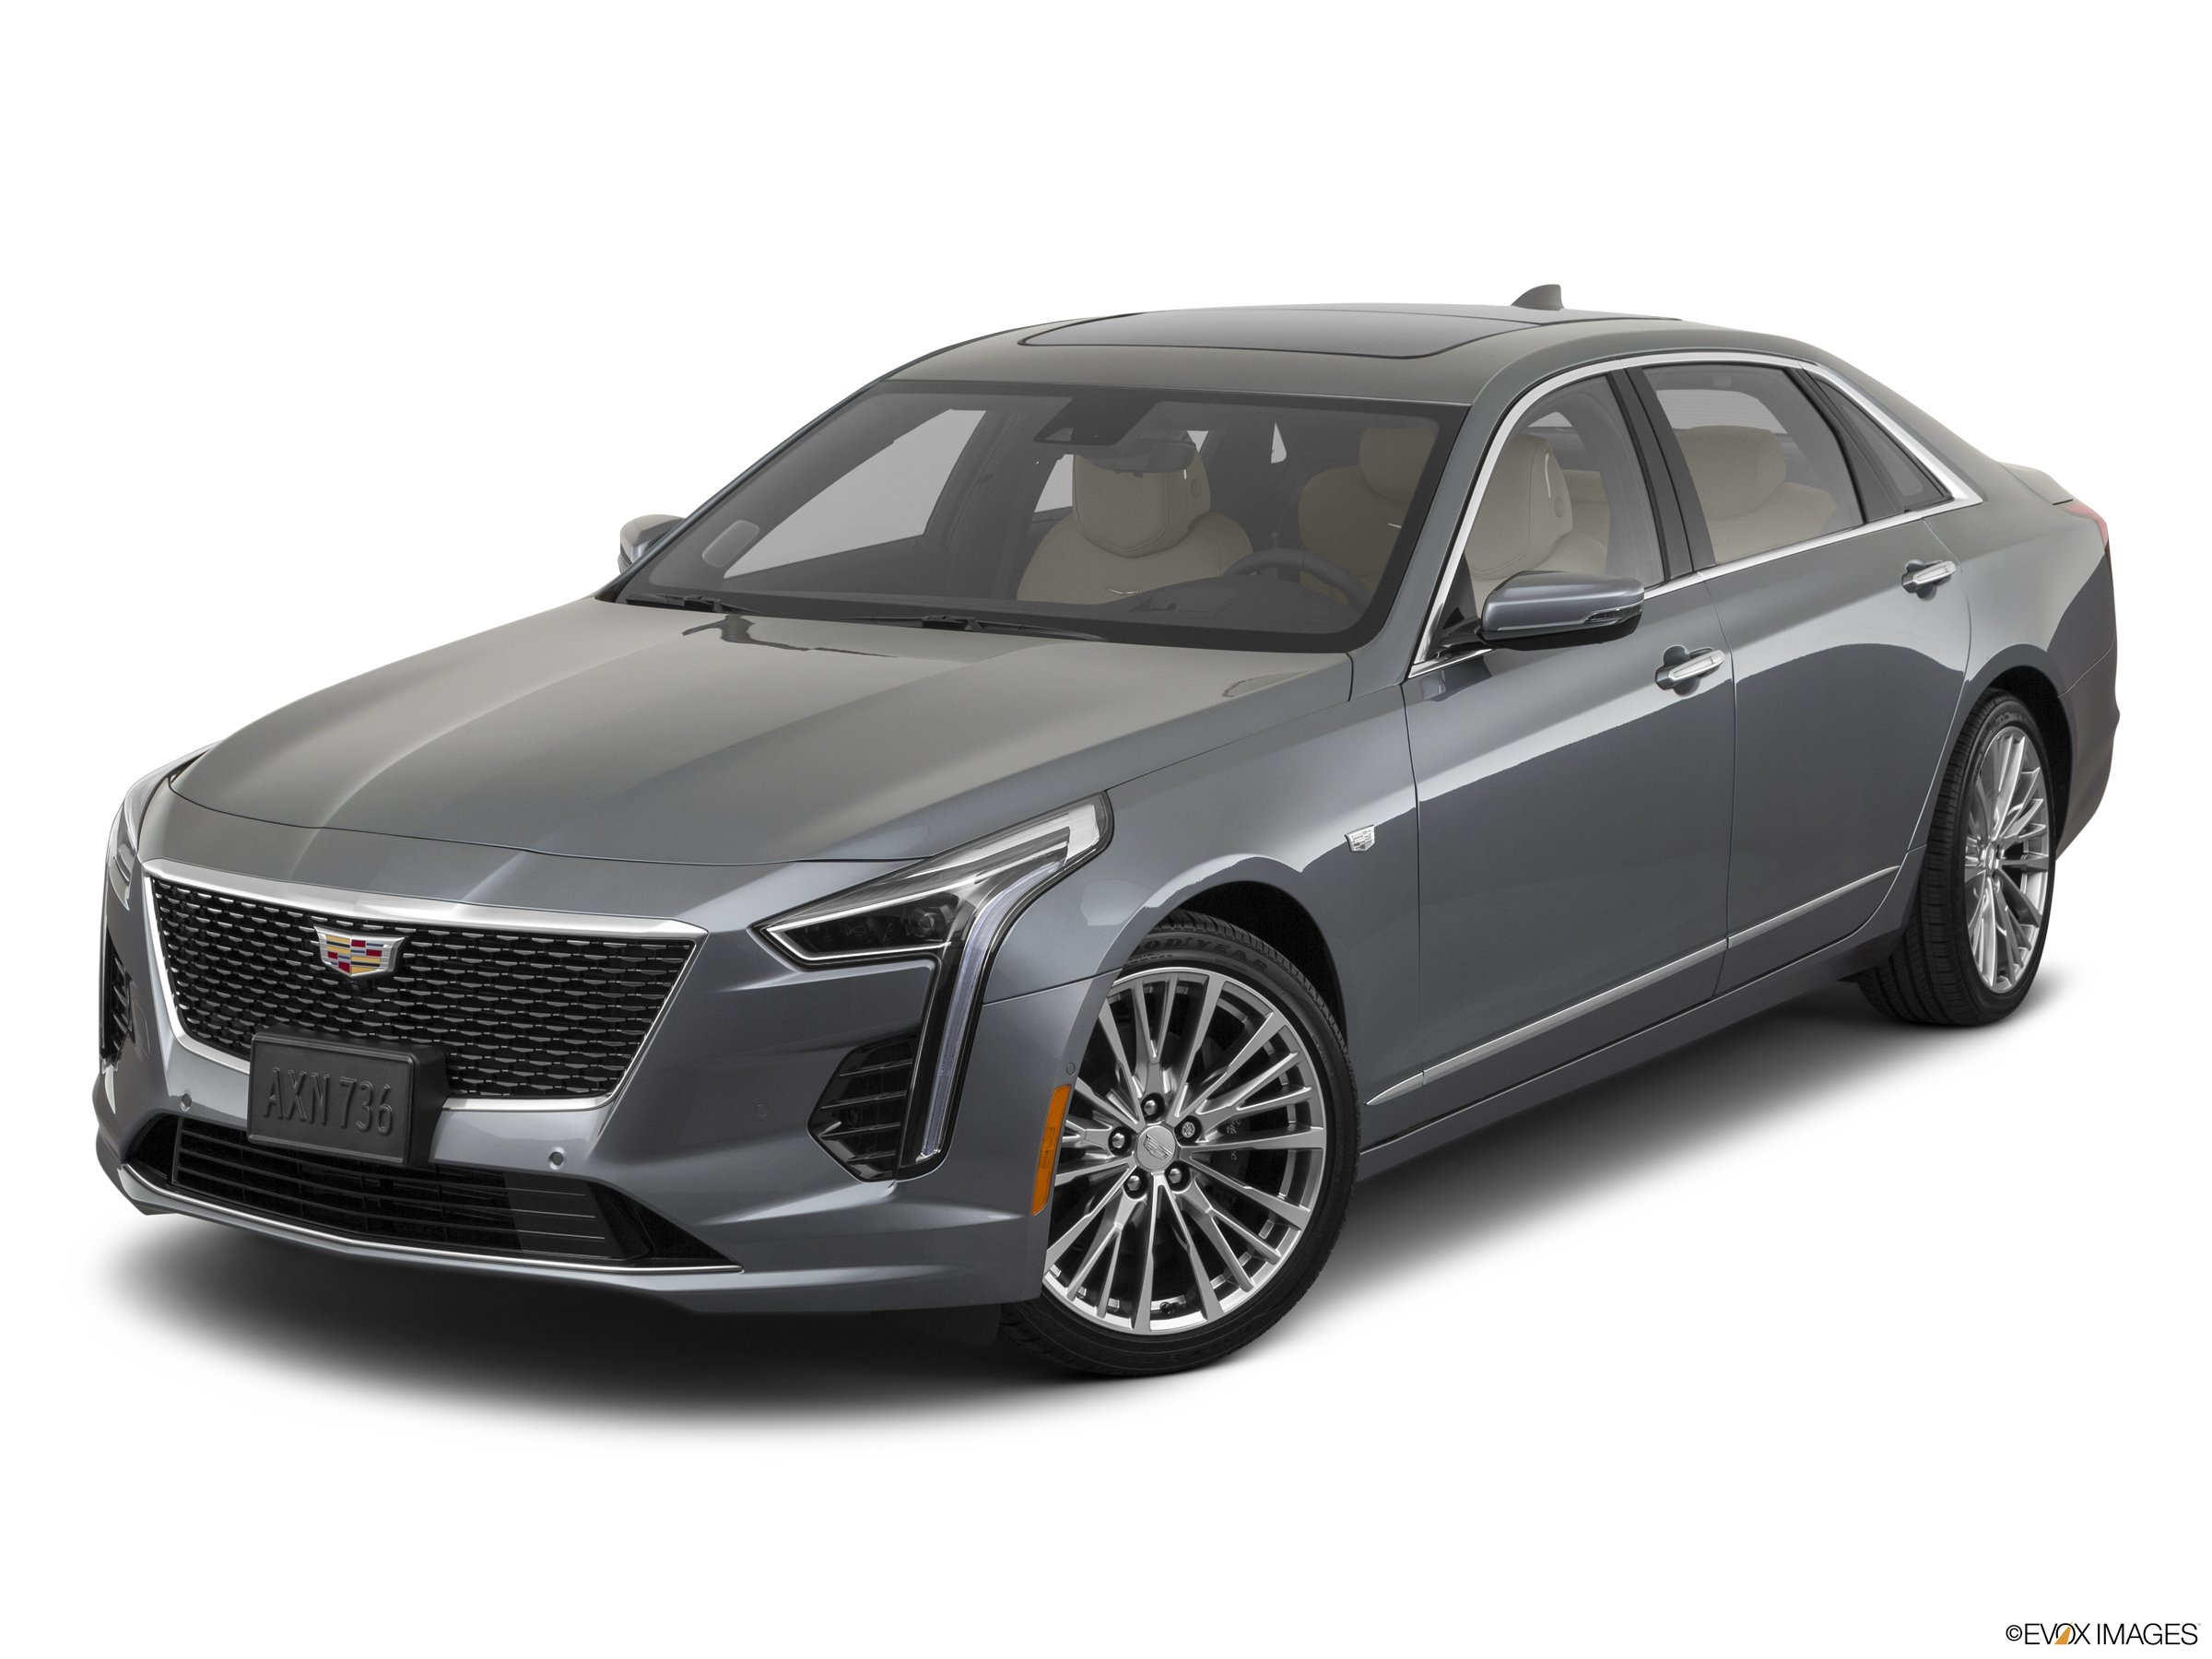 2020 Cadillac CT6 Premium Luxury AWD sedan